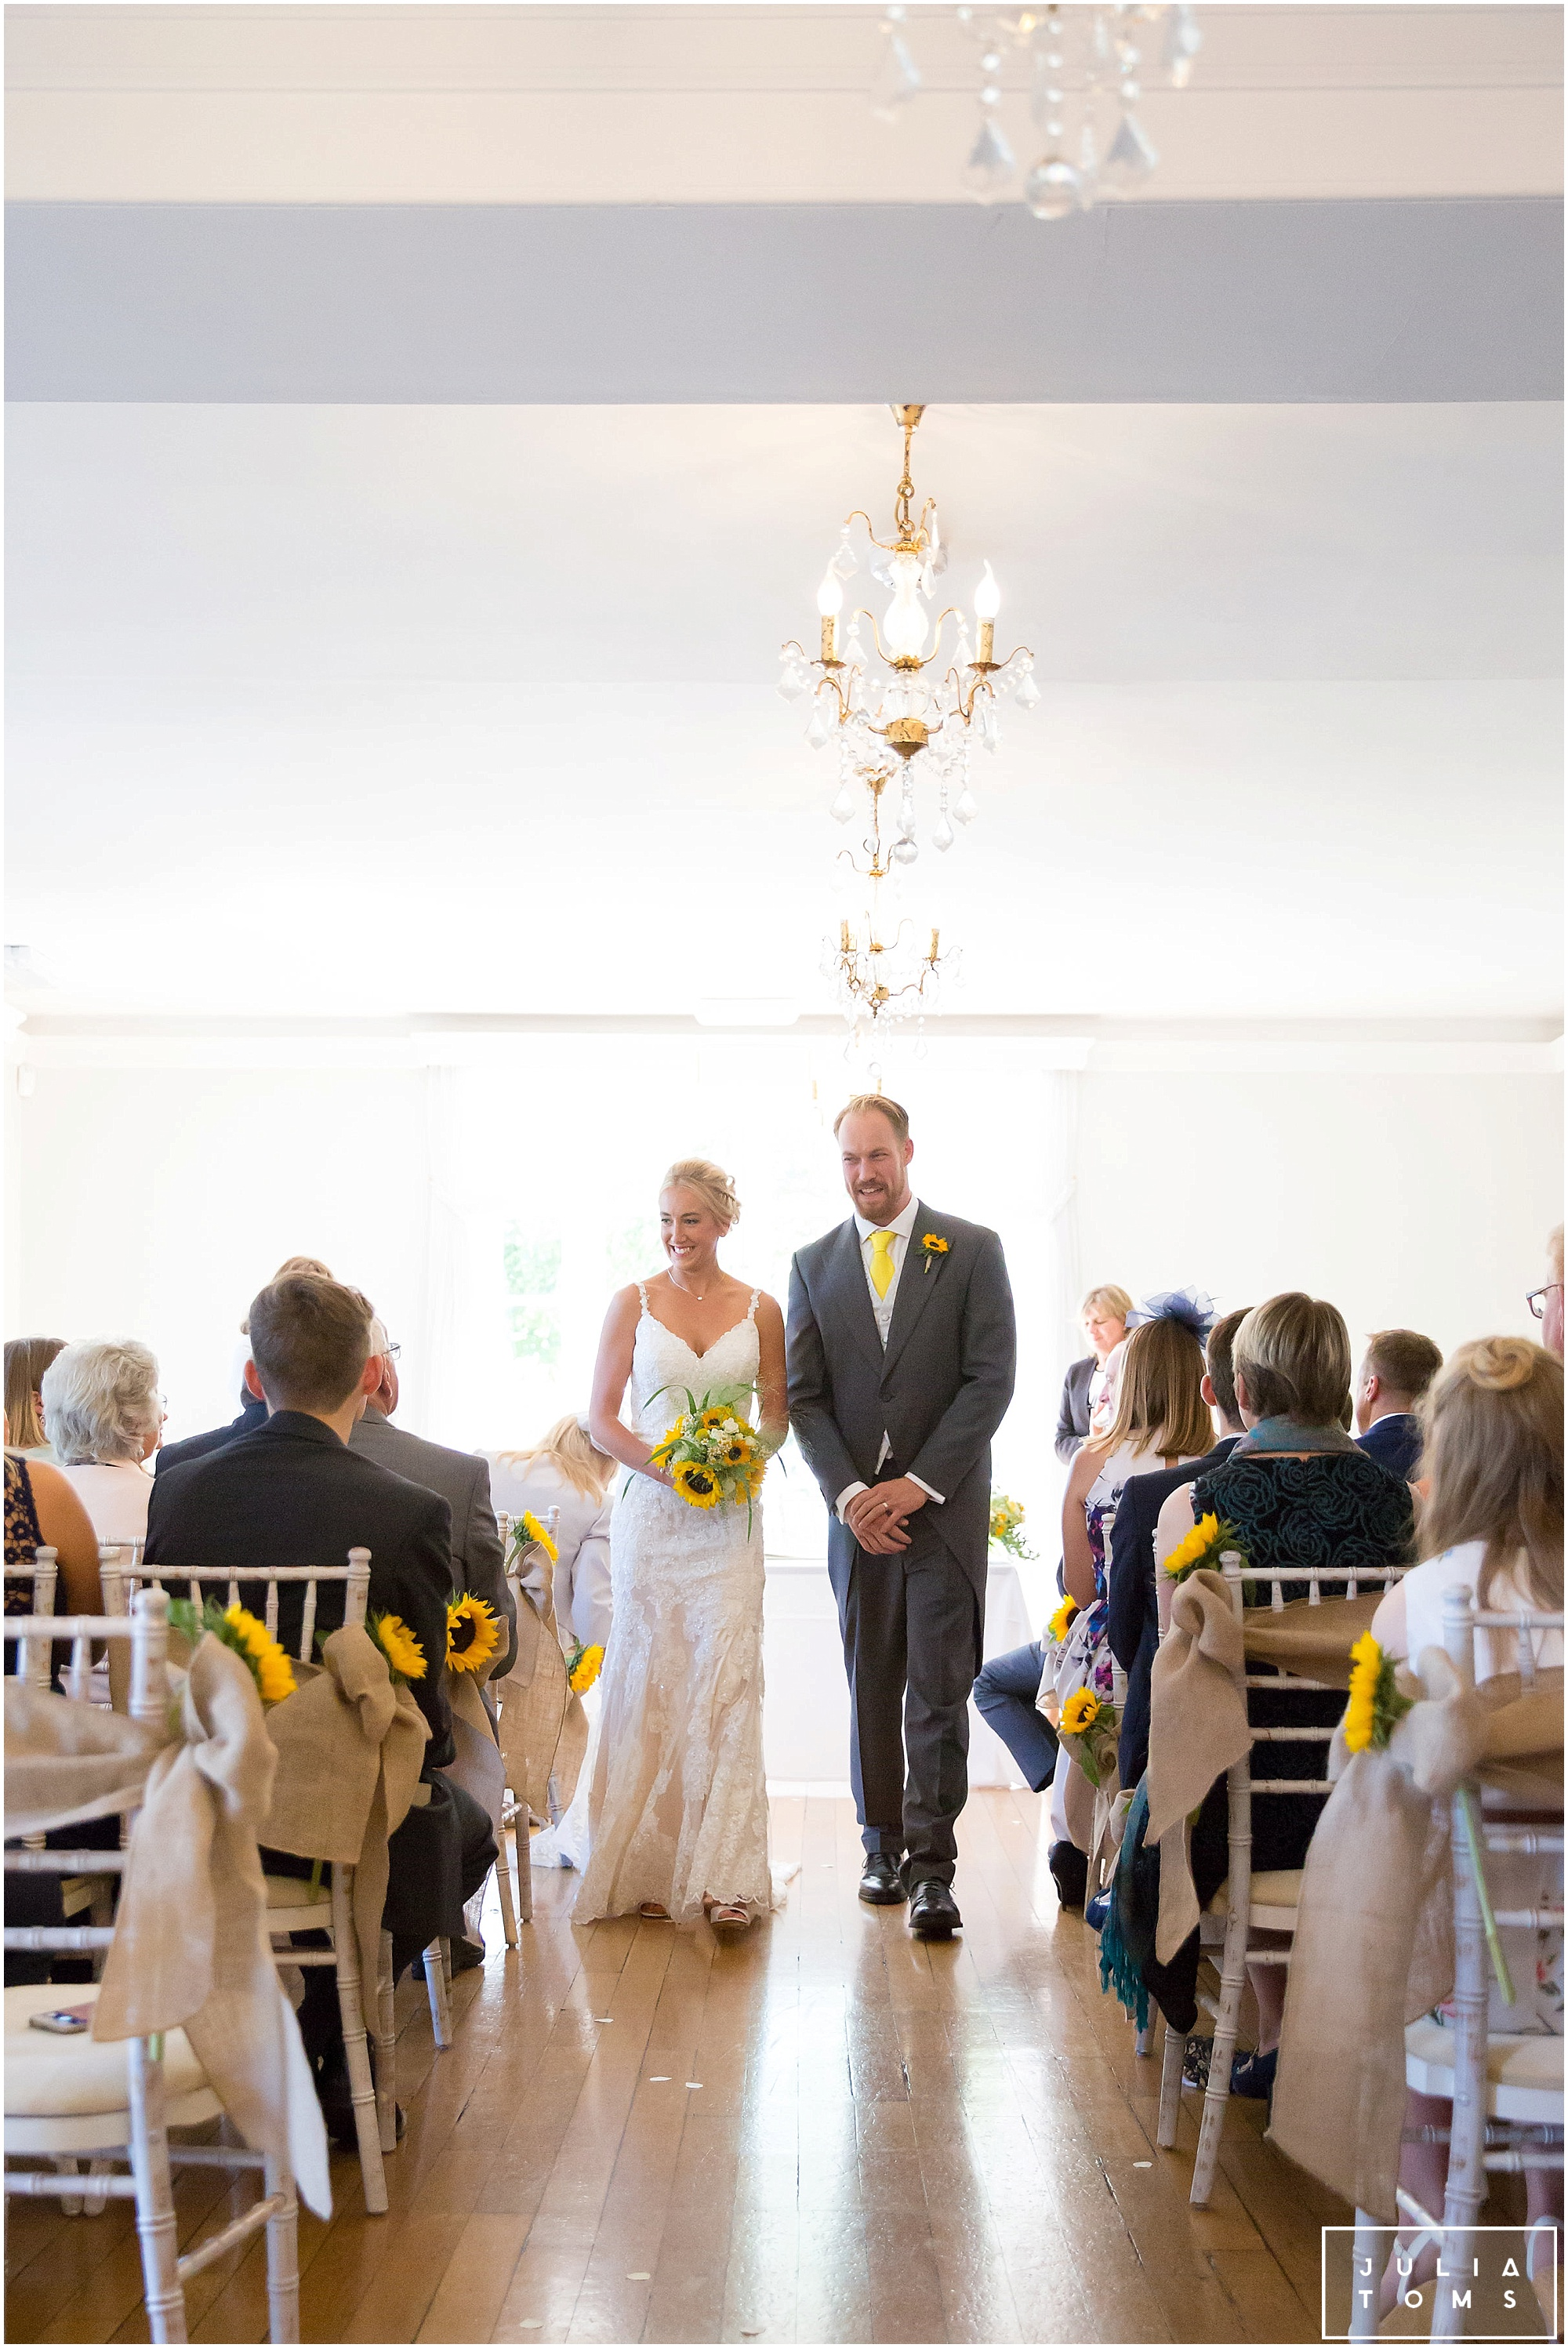 julia_toms_chichester_wedding_photographer_worthing_042.jpg